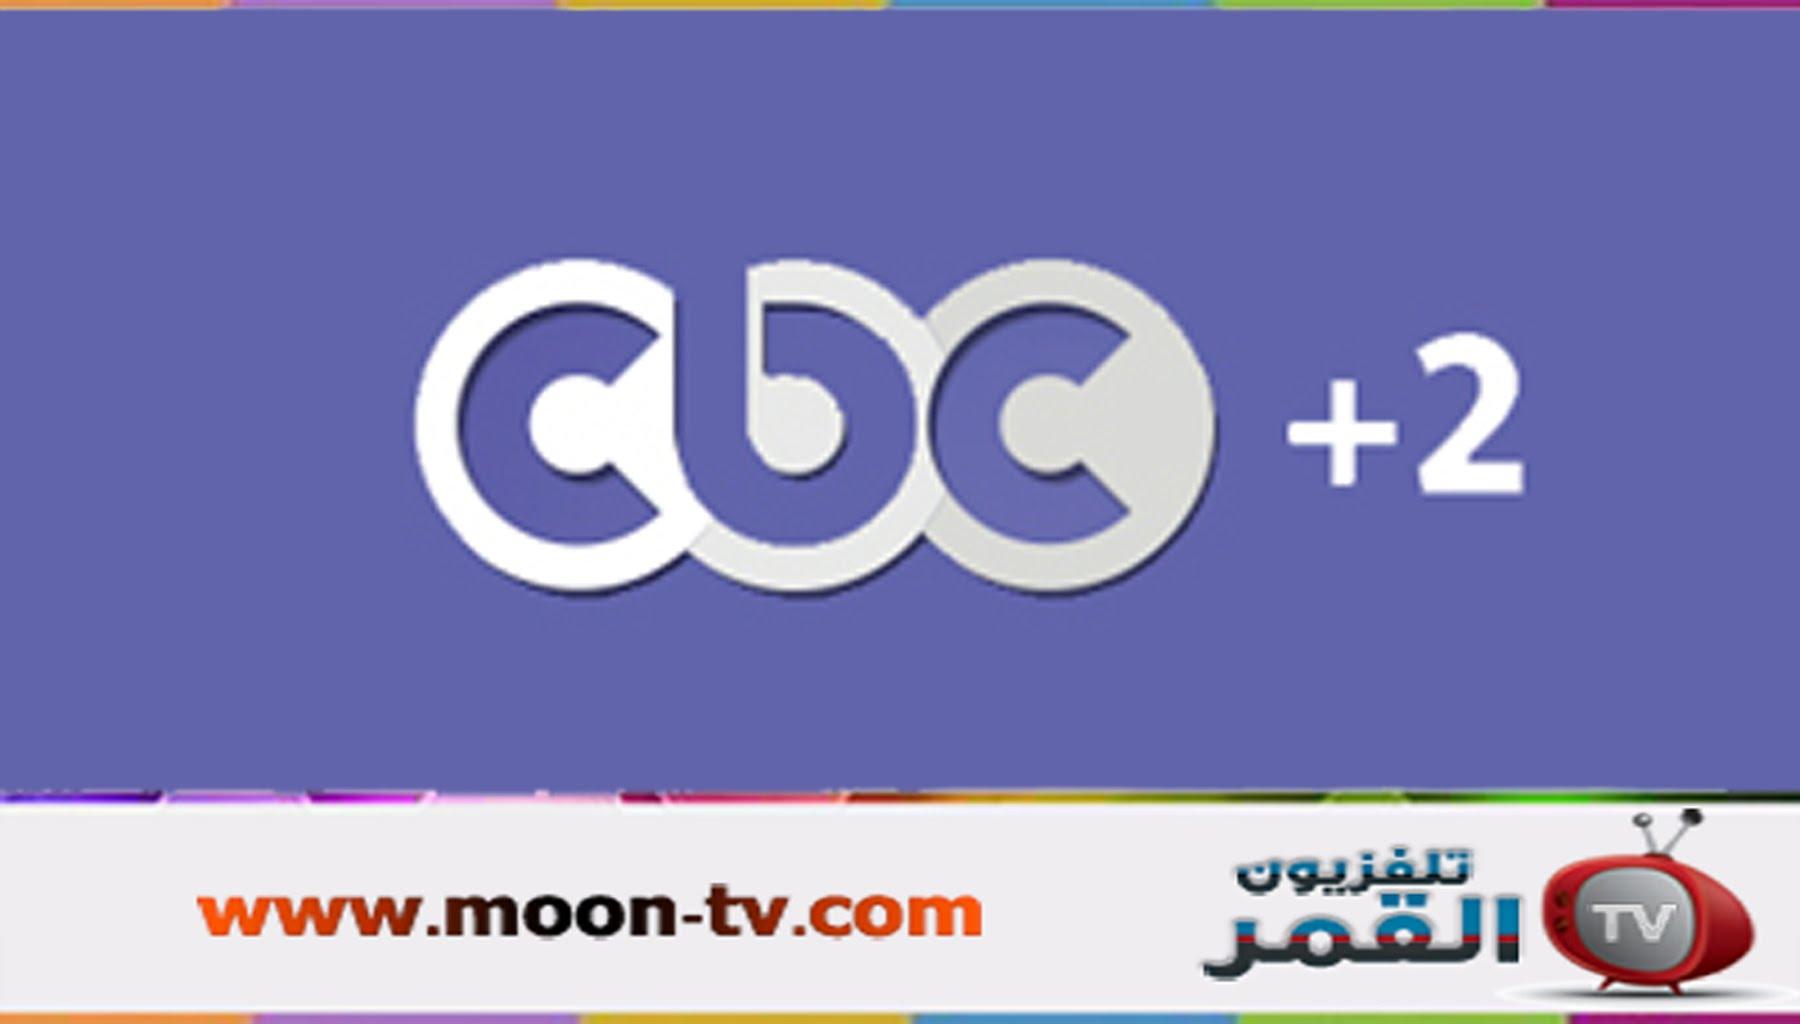 بالصور تردد سى بى سى 2 , تردد قناة CBC 2 على النايل سات 74778